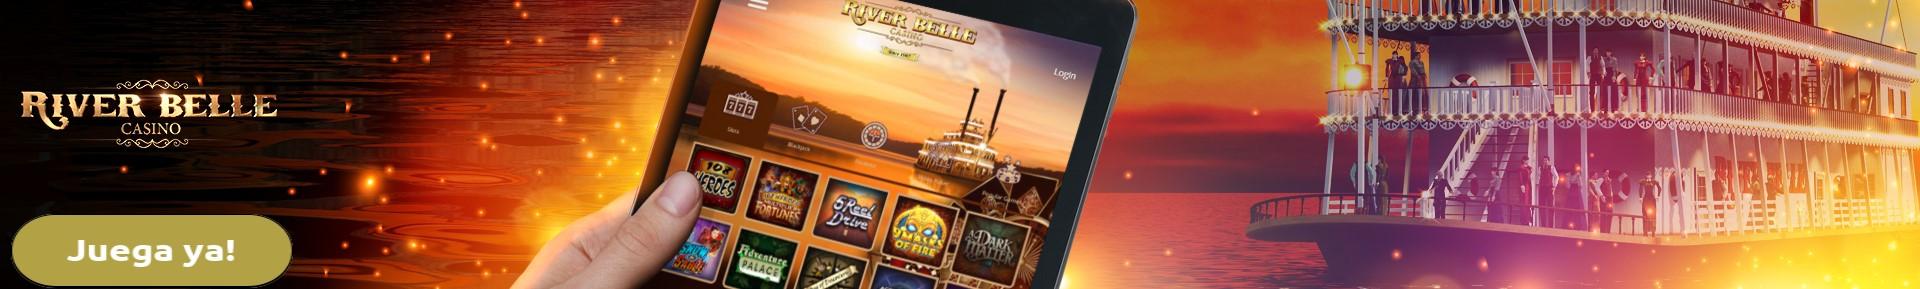 rivver belle casino promociones